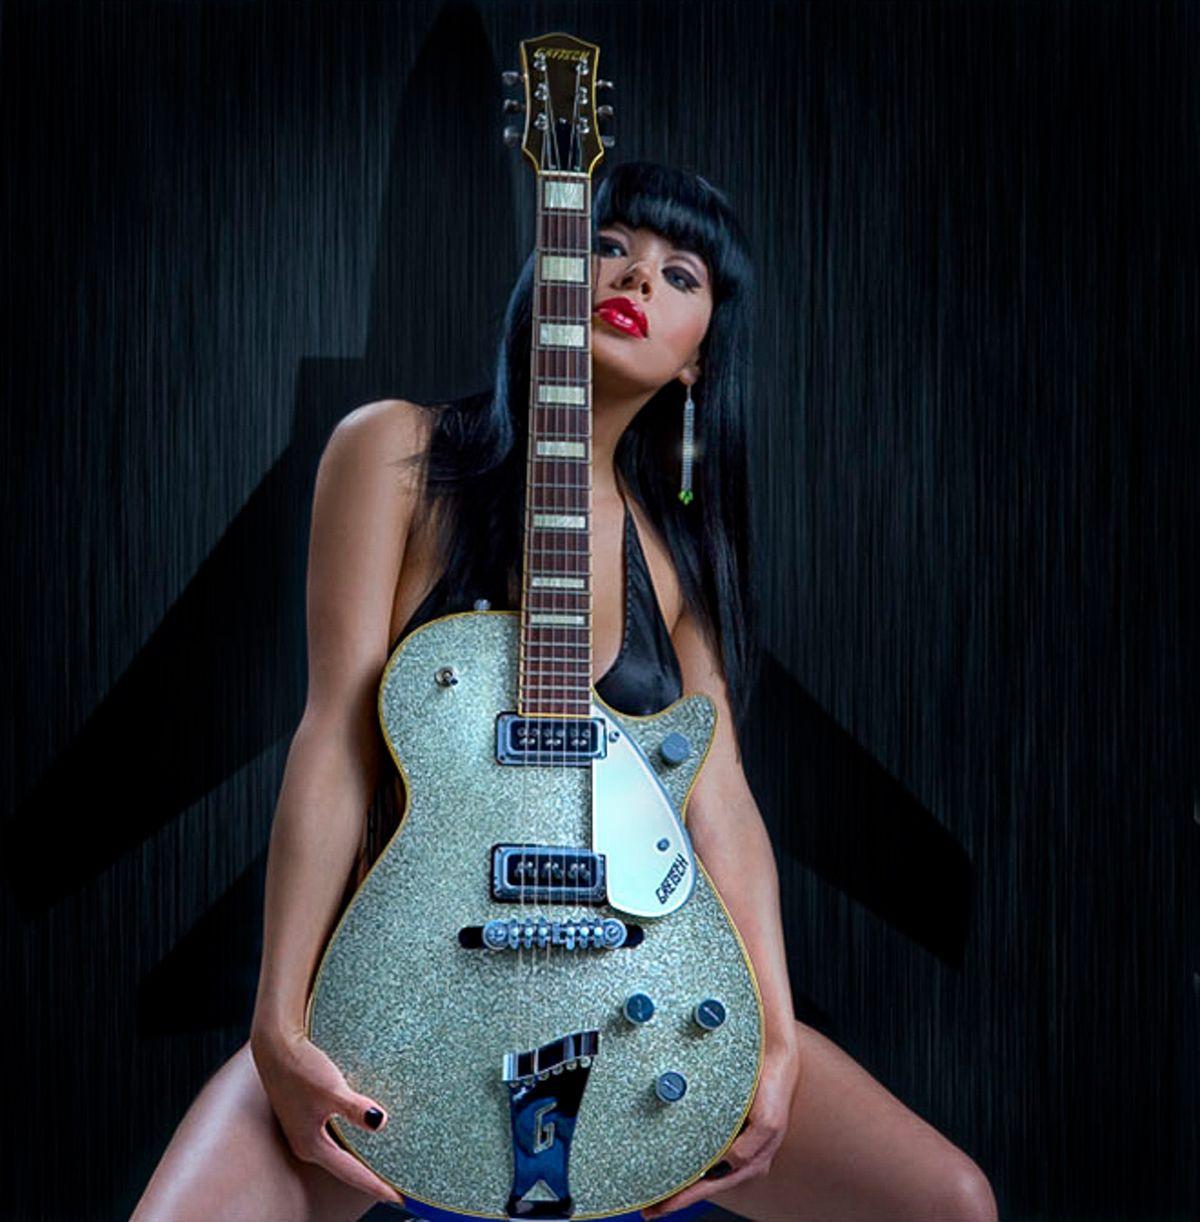 Guitar_22.jpg